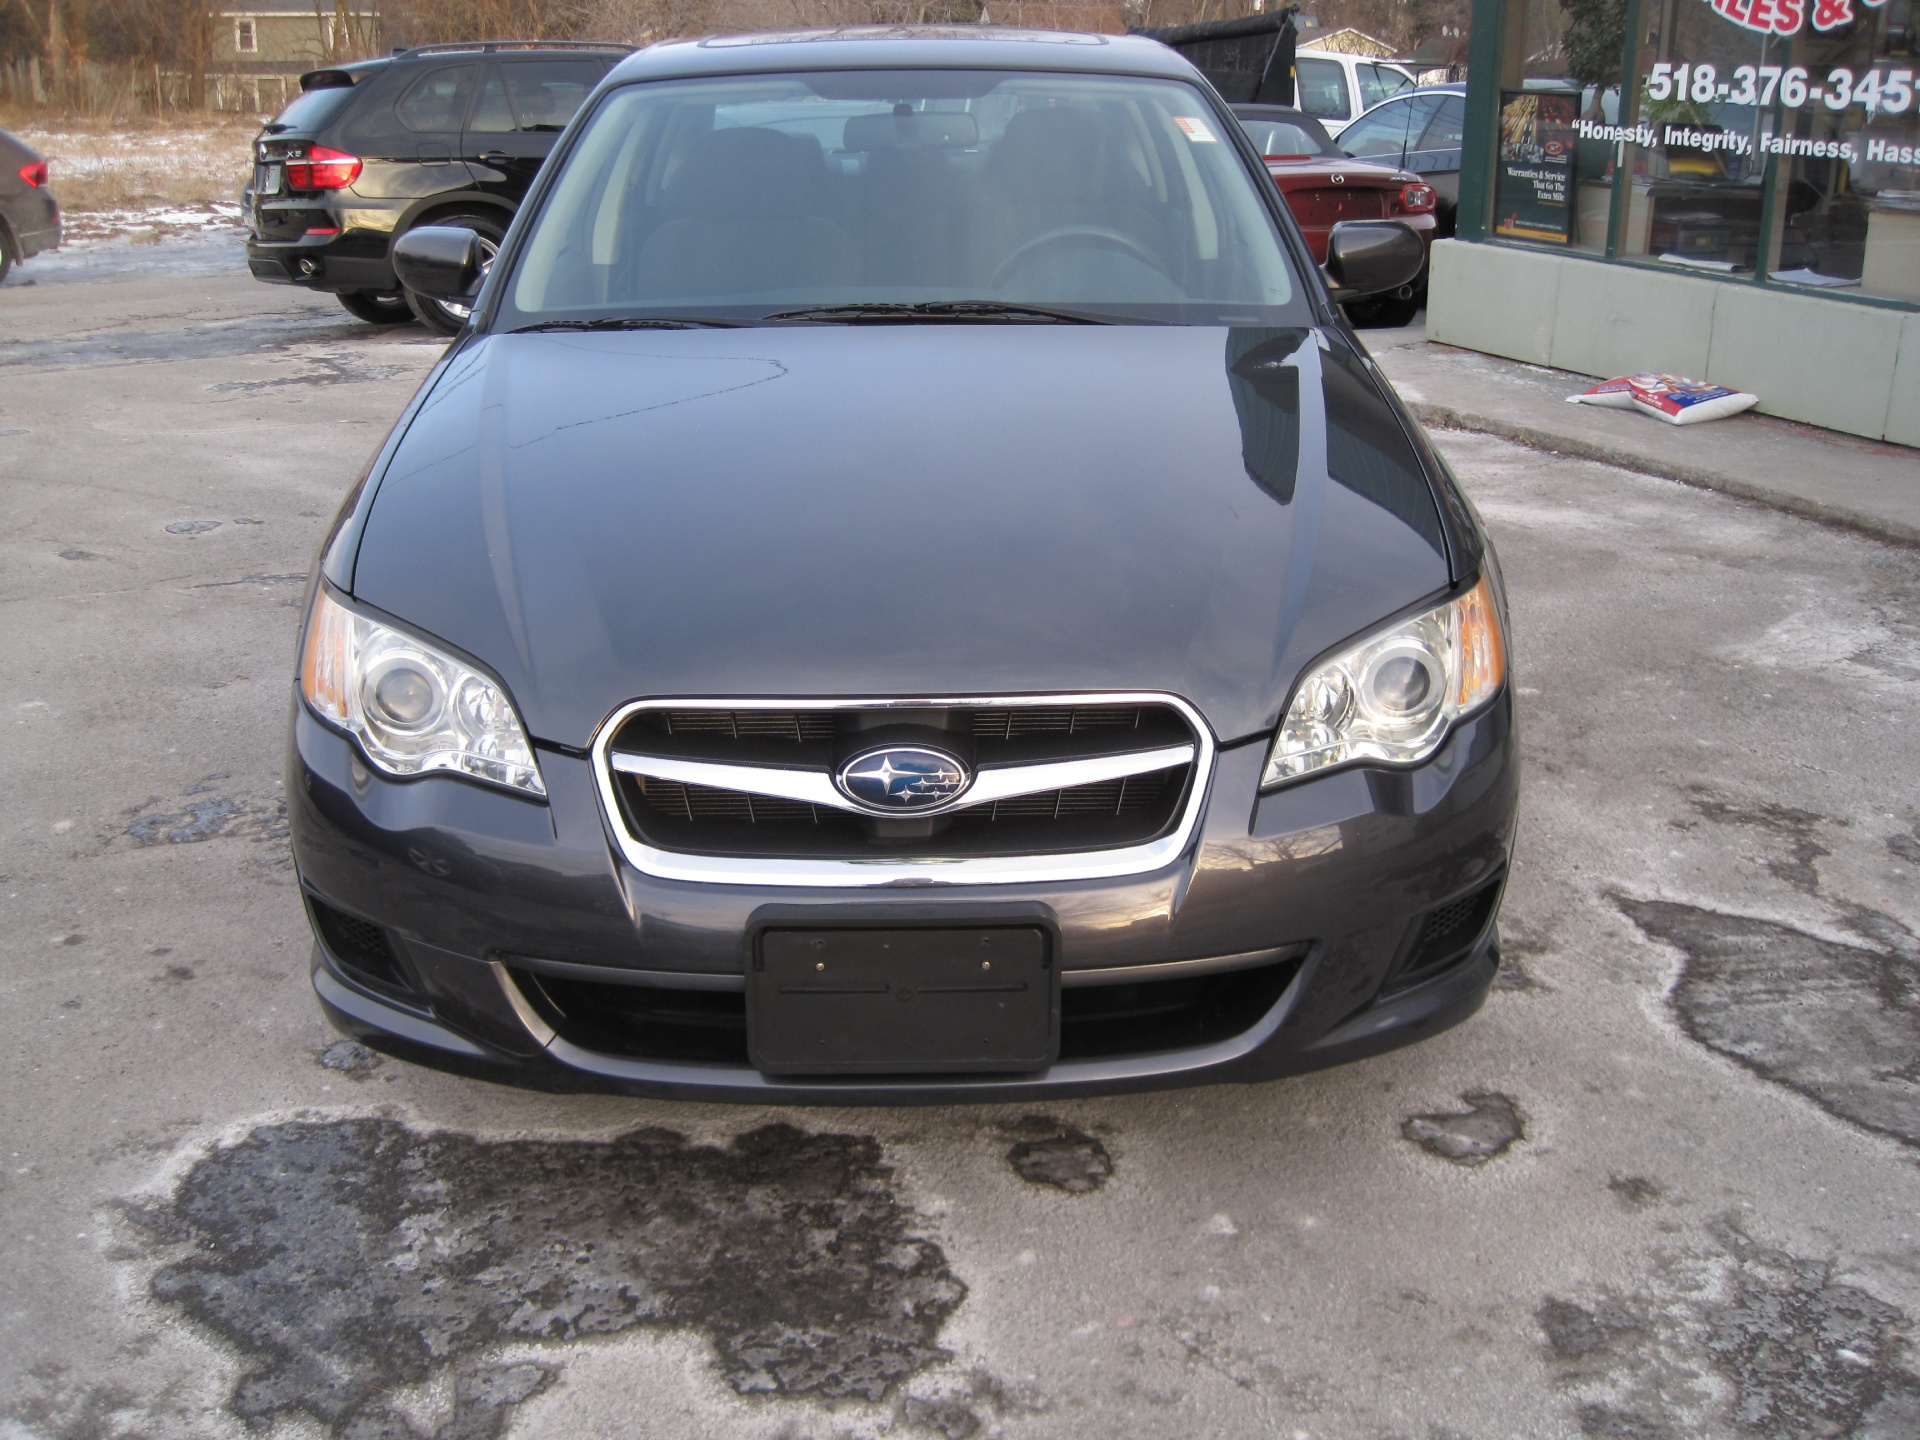 Subaru Legacy: Driver's seat